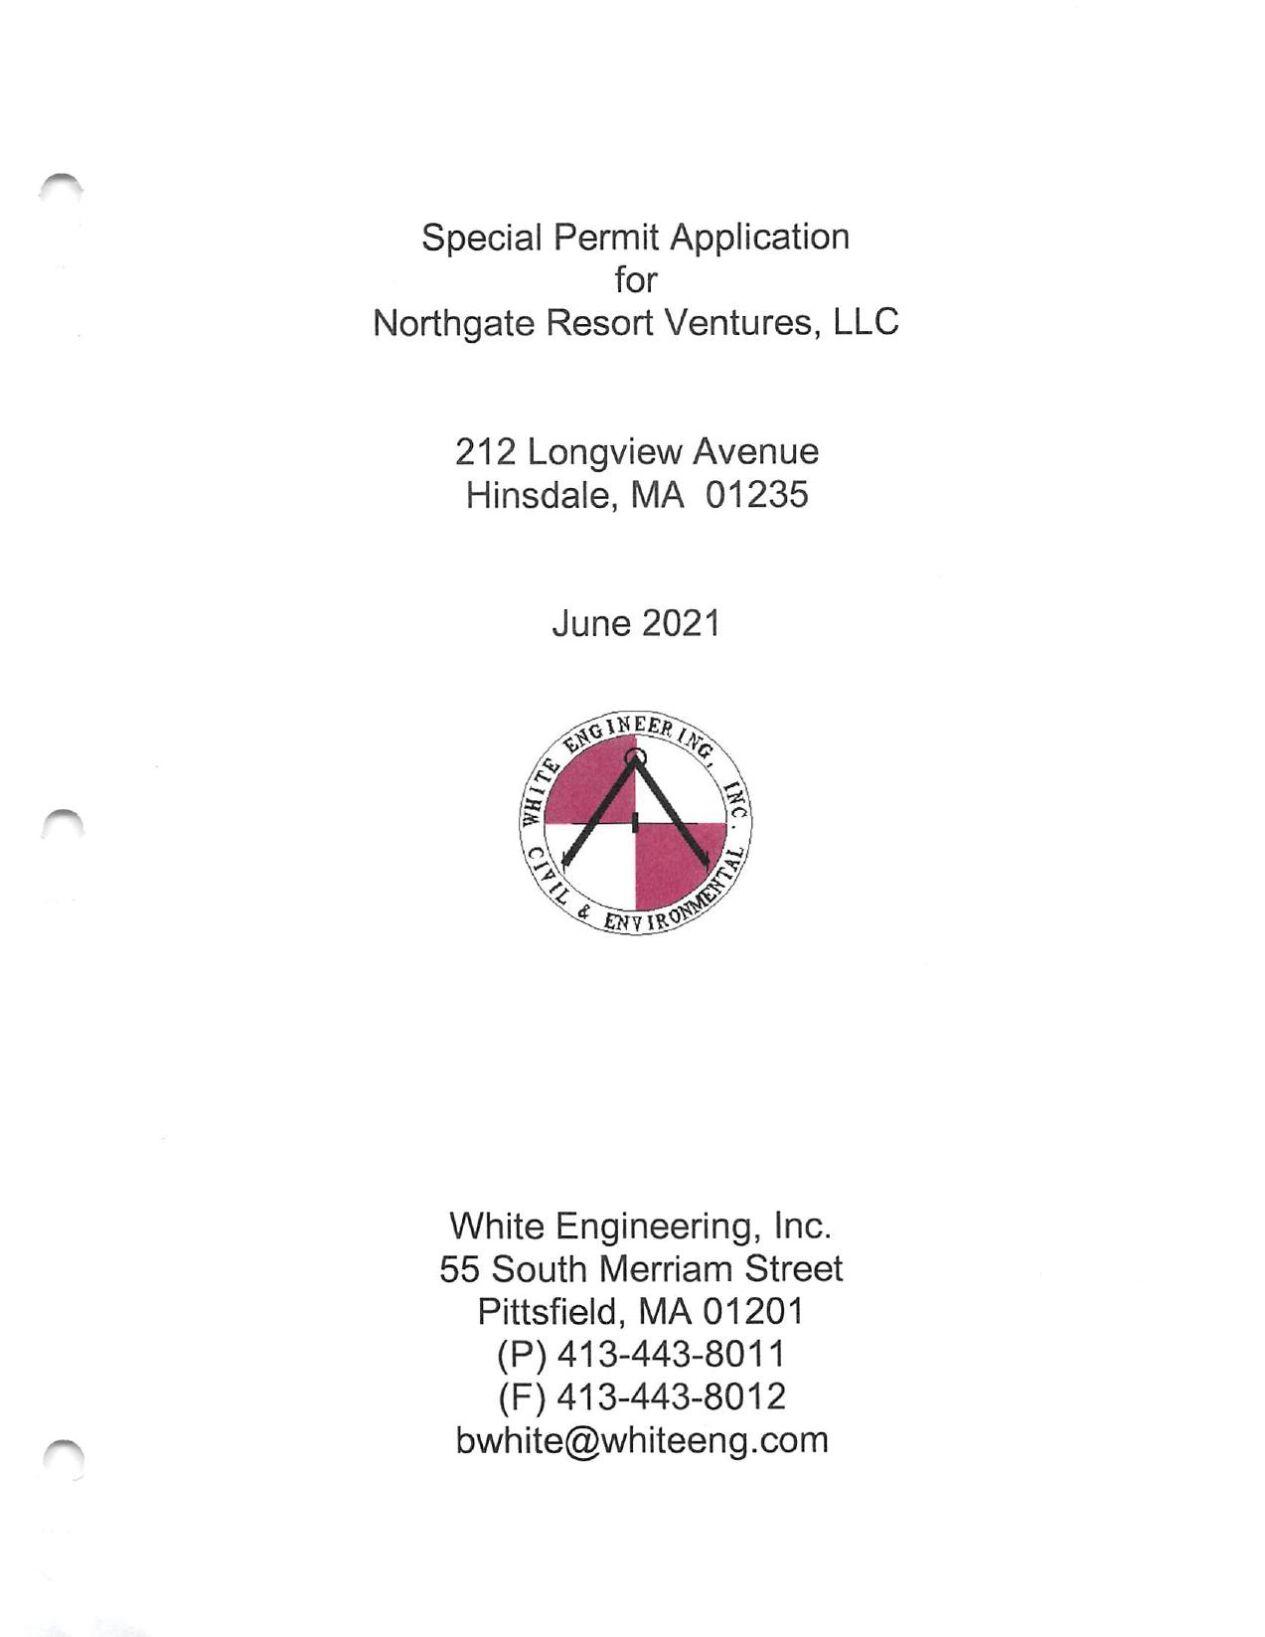 Northgate Resort Ventures LLC application